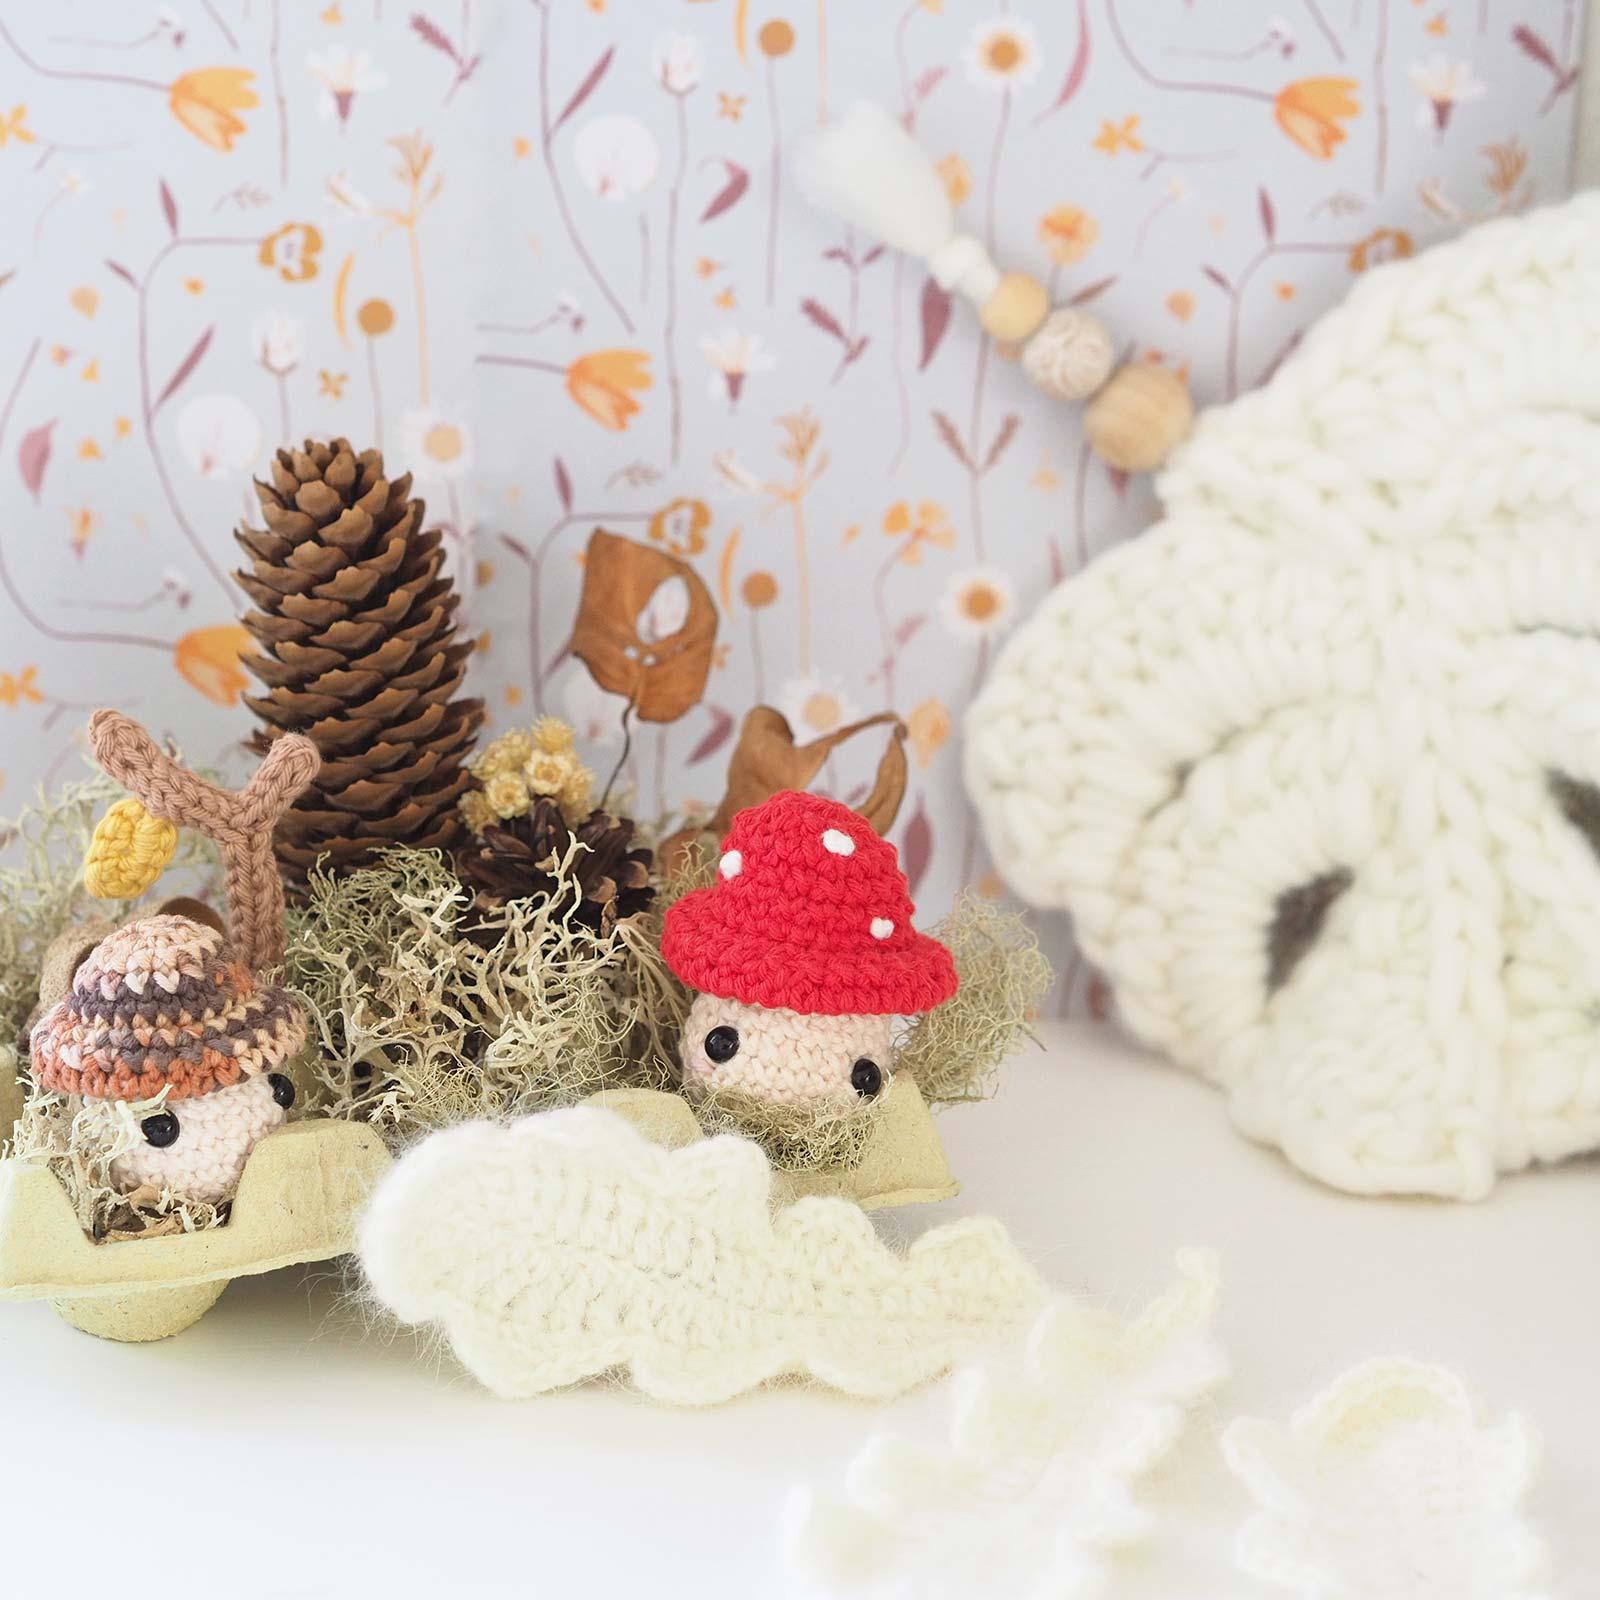 deco-automne-amigurumi-champignon-laboutiquedemelimelo